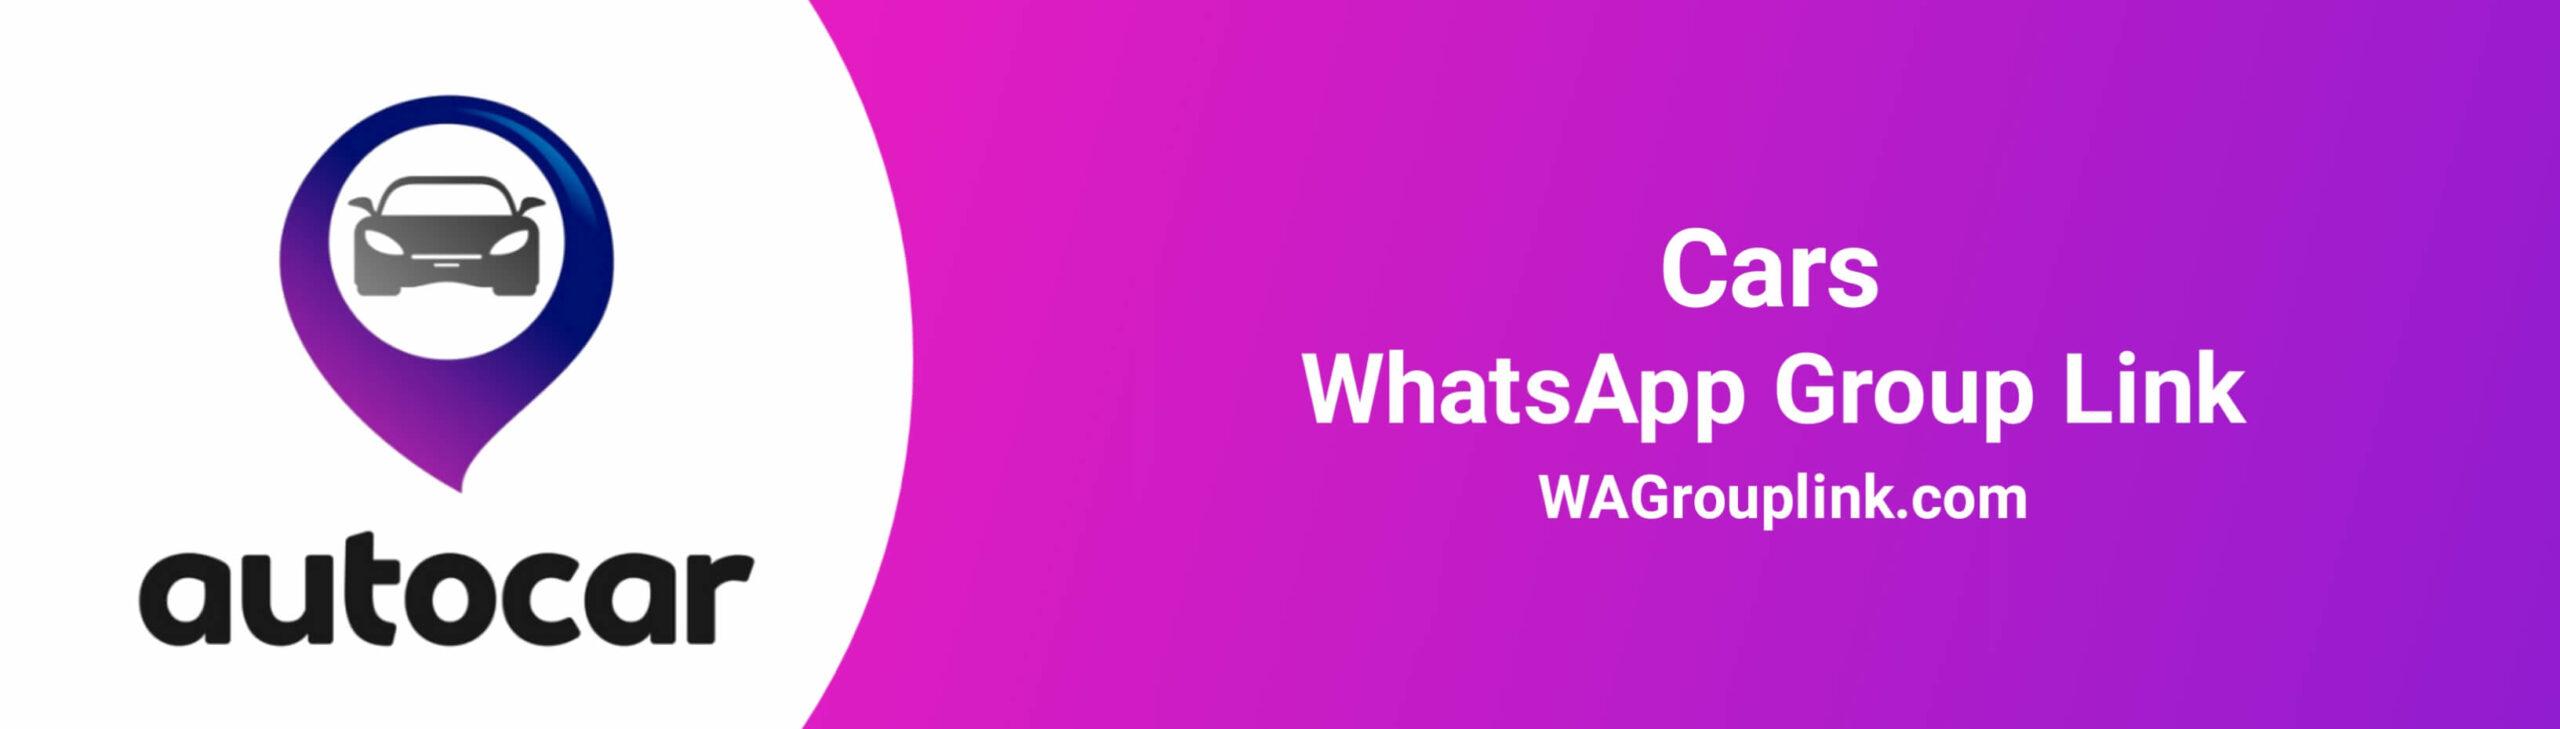 Cars WhatsApp Group Link